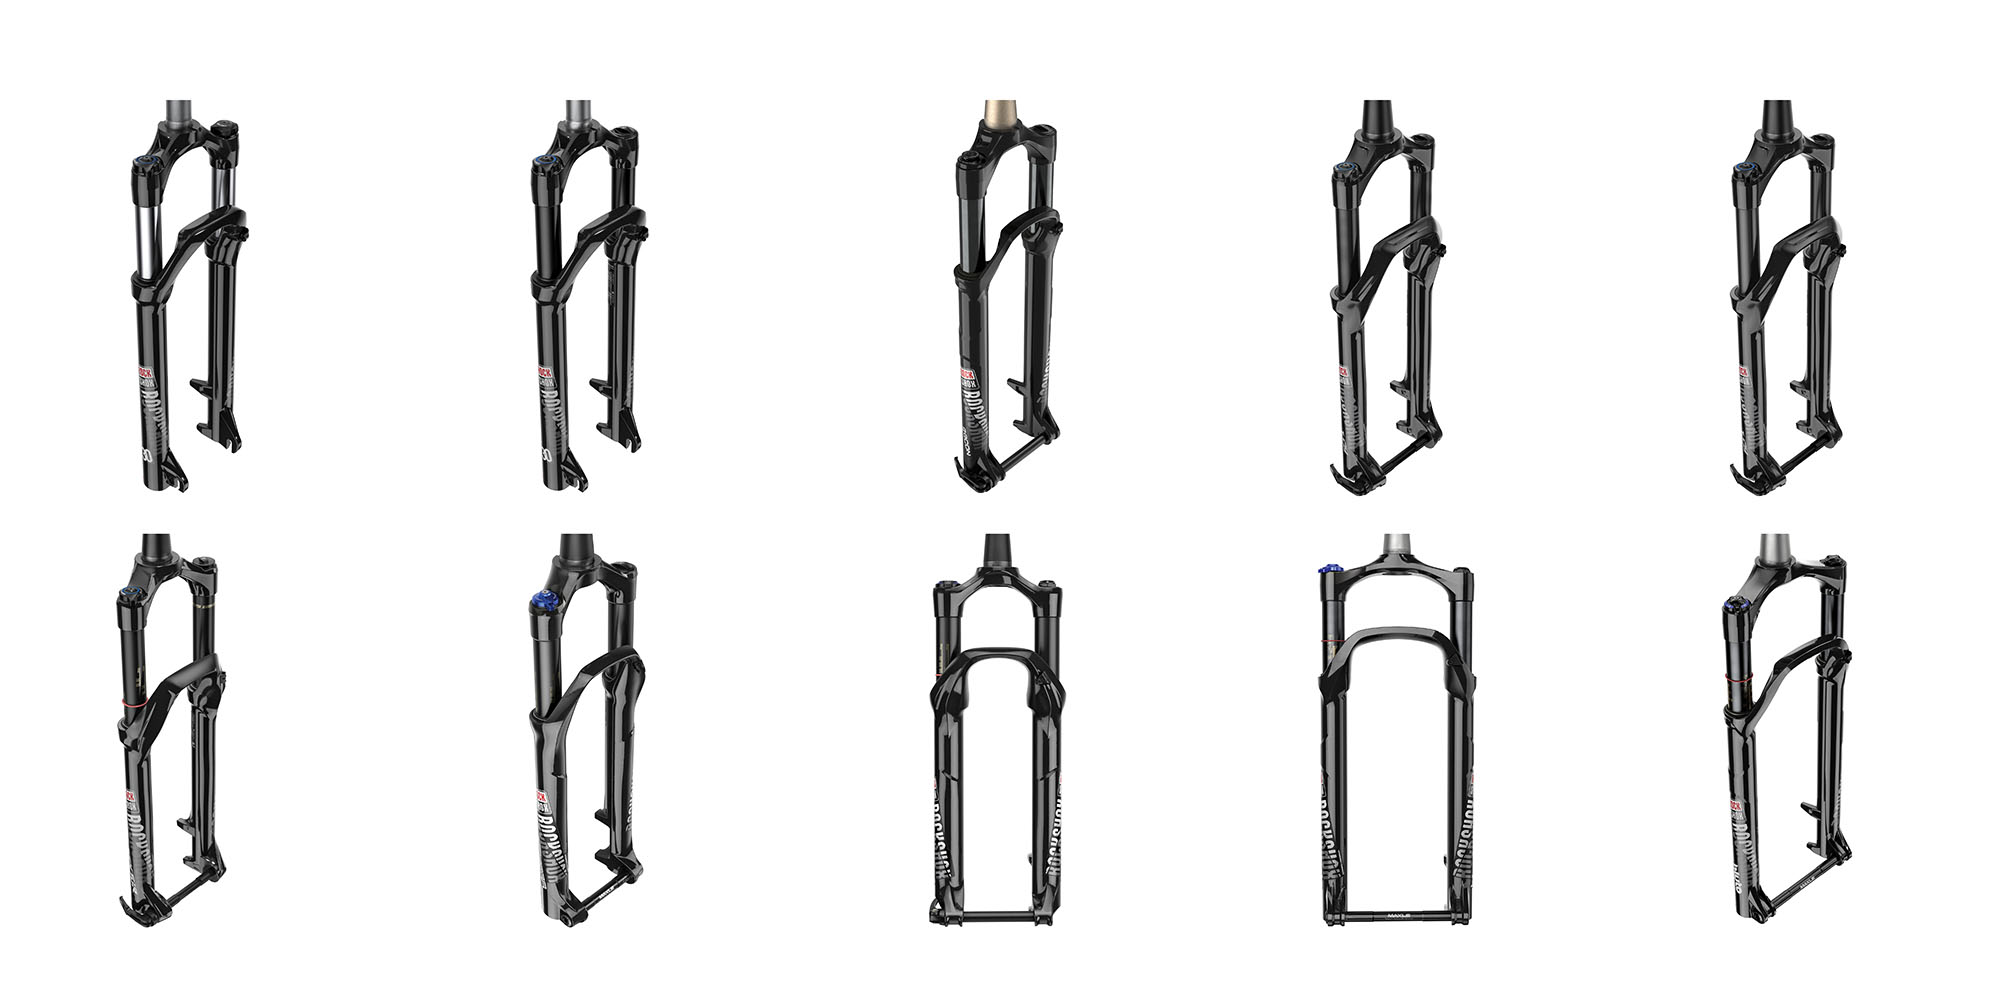 Rock Shox entry & mid range forks